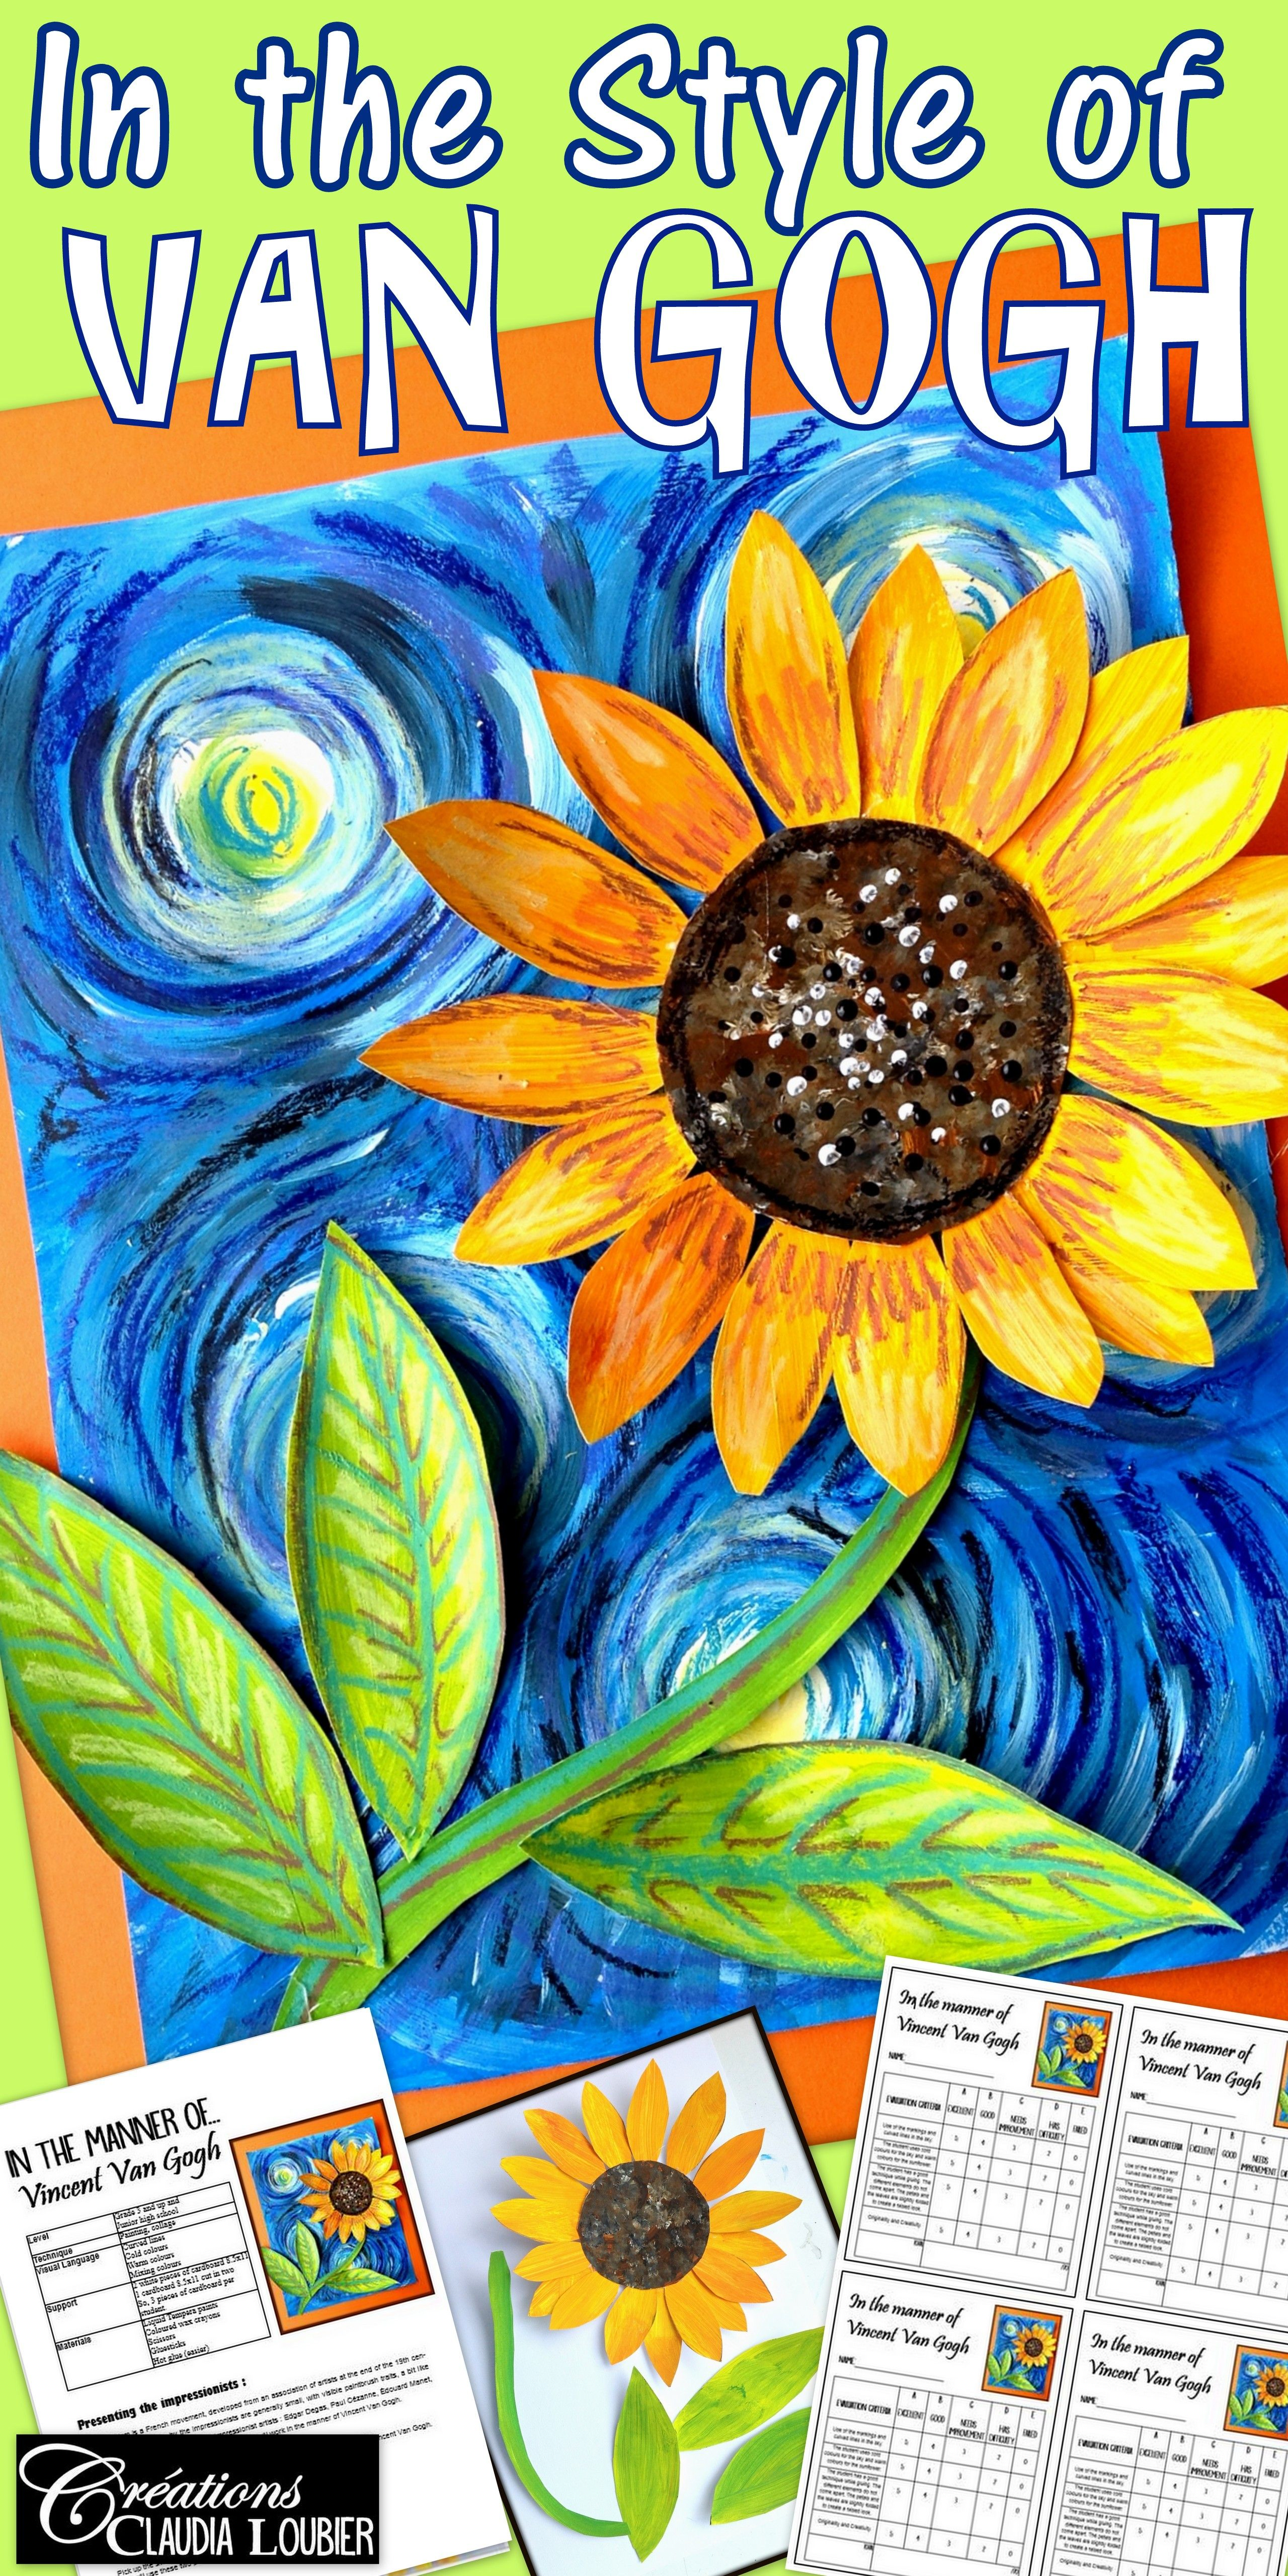 In The Style Of Vincent Van Gogh Spring Art Lesson For Kids Impressionnist En